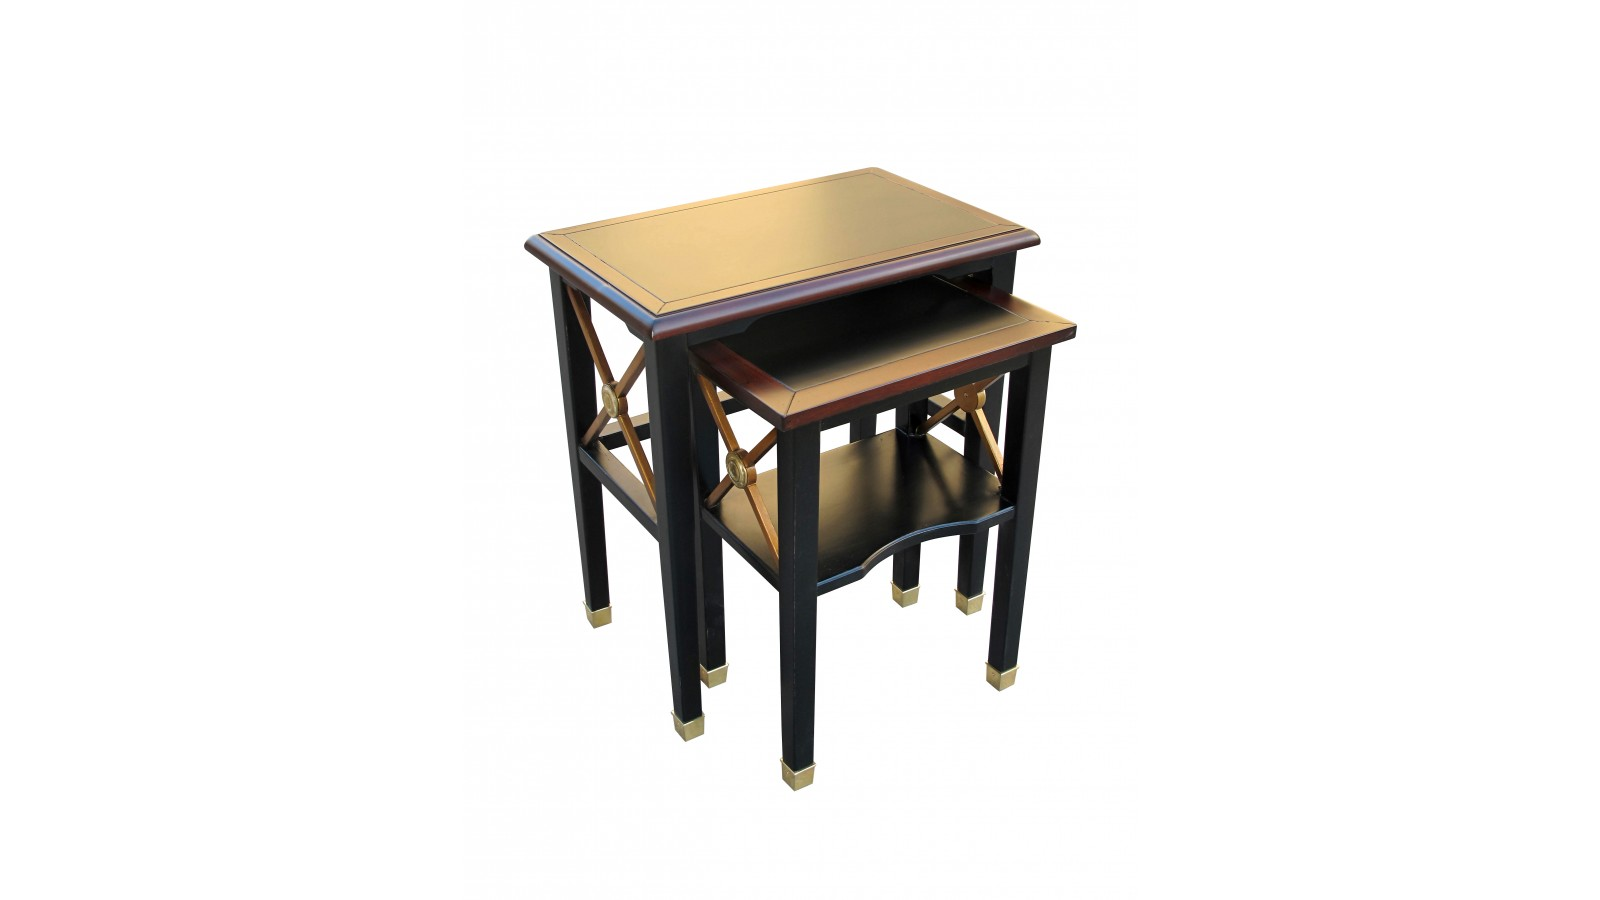 ... Chicago Nest Of 2 Tables M838 MONTIGNY M838_c_black_10_gold_detail_13m1021 5  ...